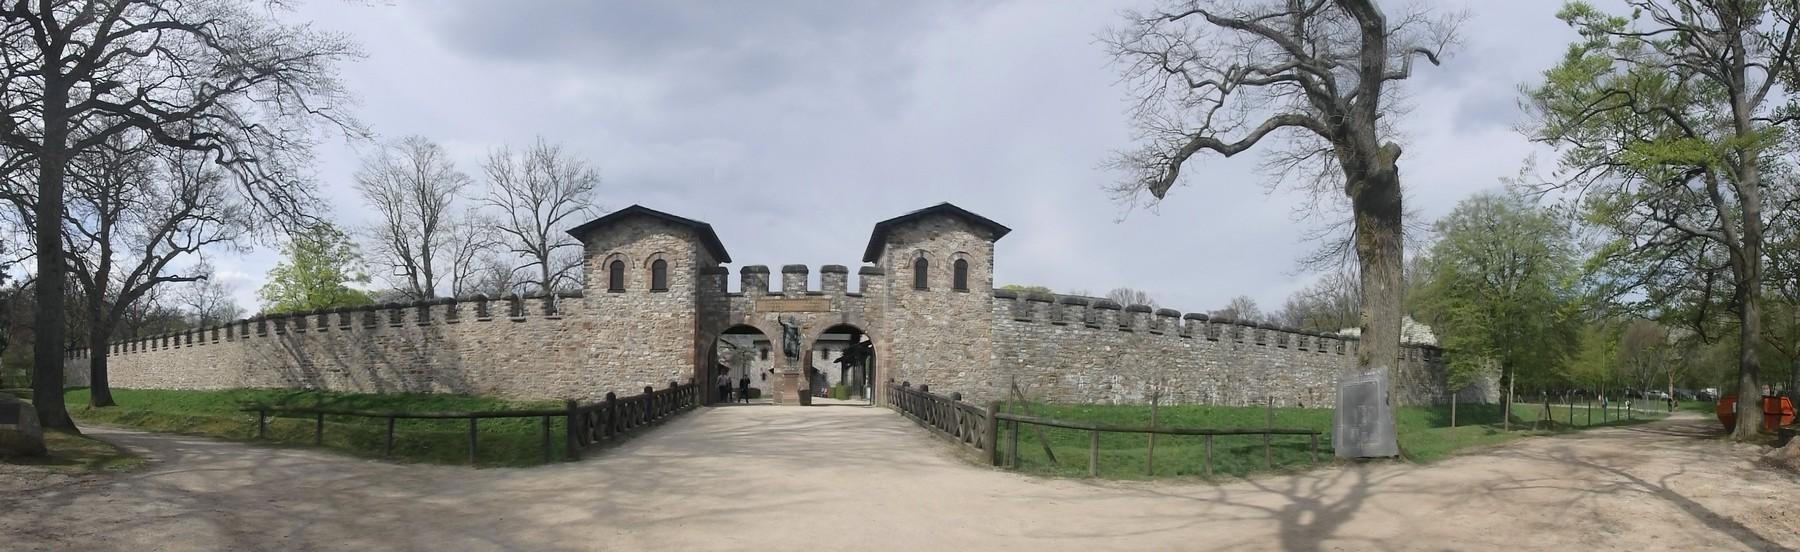 P4065235 Pano Antiguas Fronteras Romanas Unesco Alemania